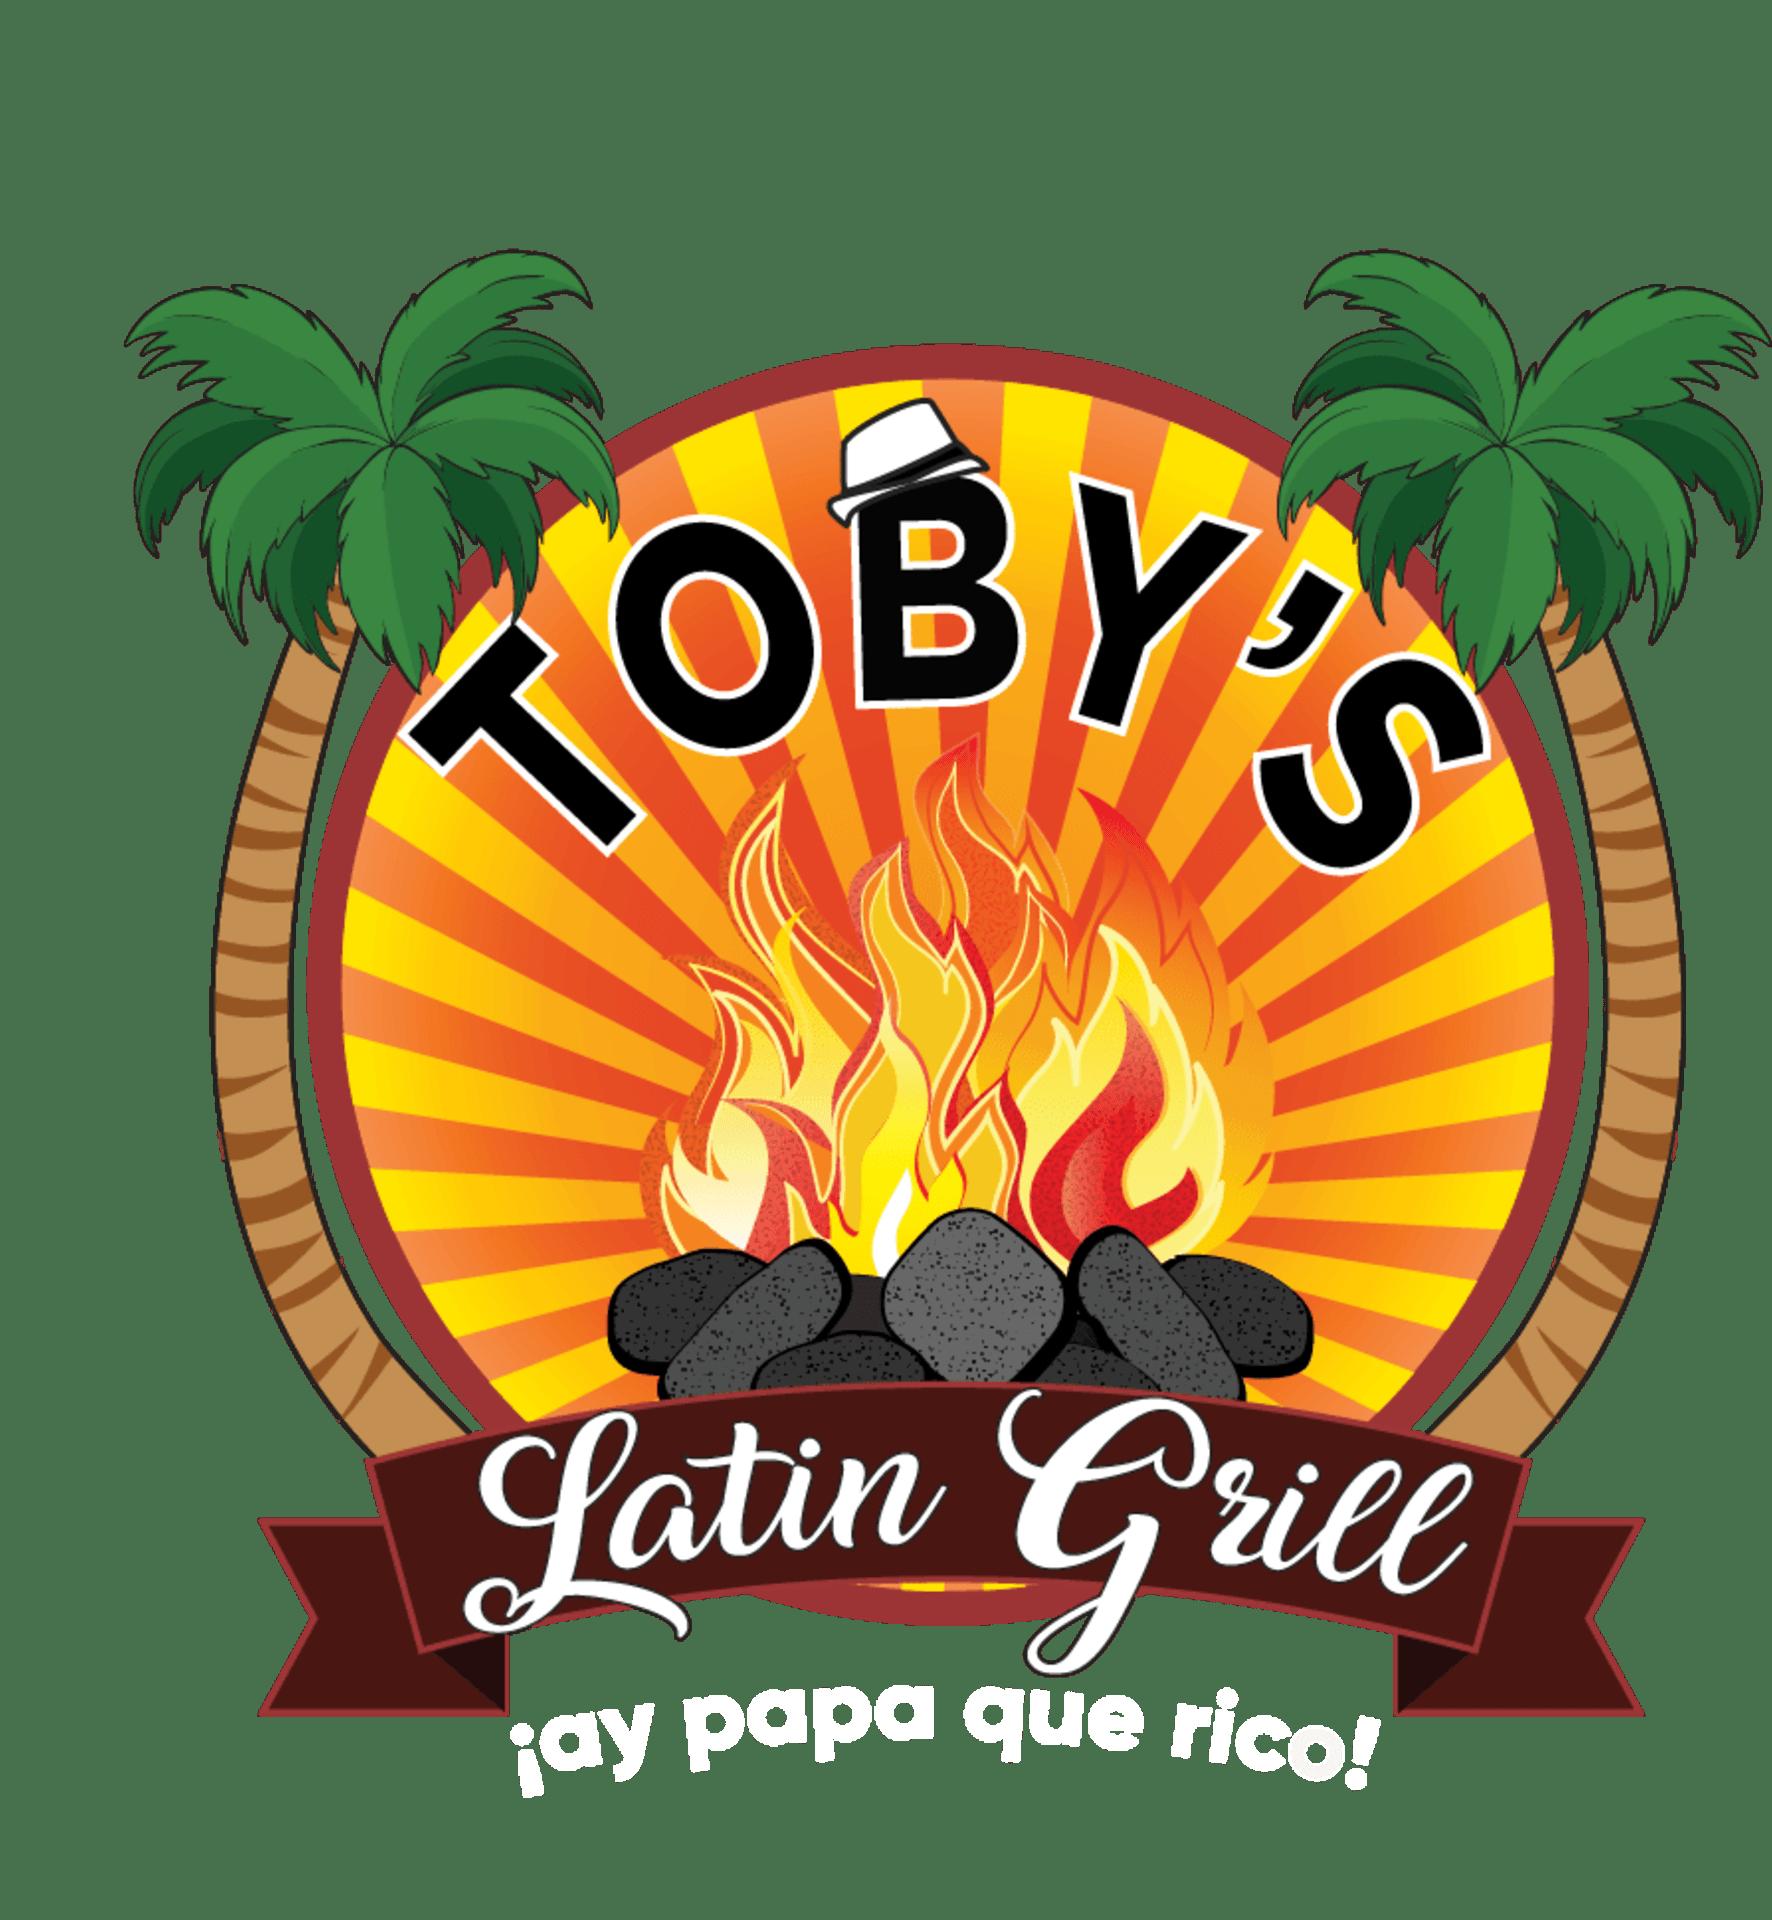 Toby's Latin Grill: Ay papa que rico!